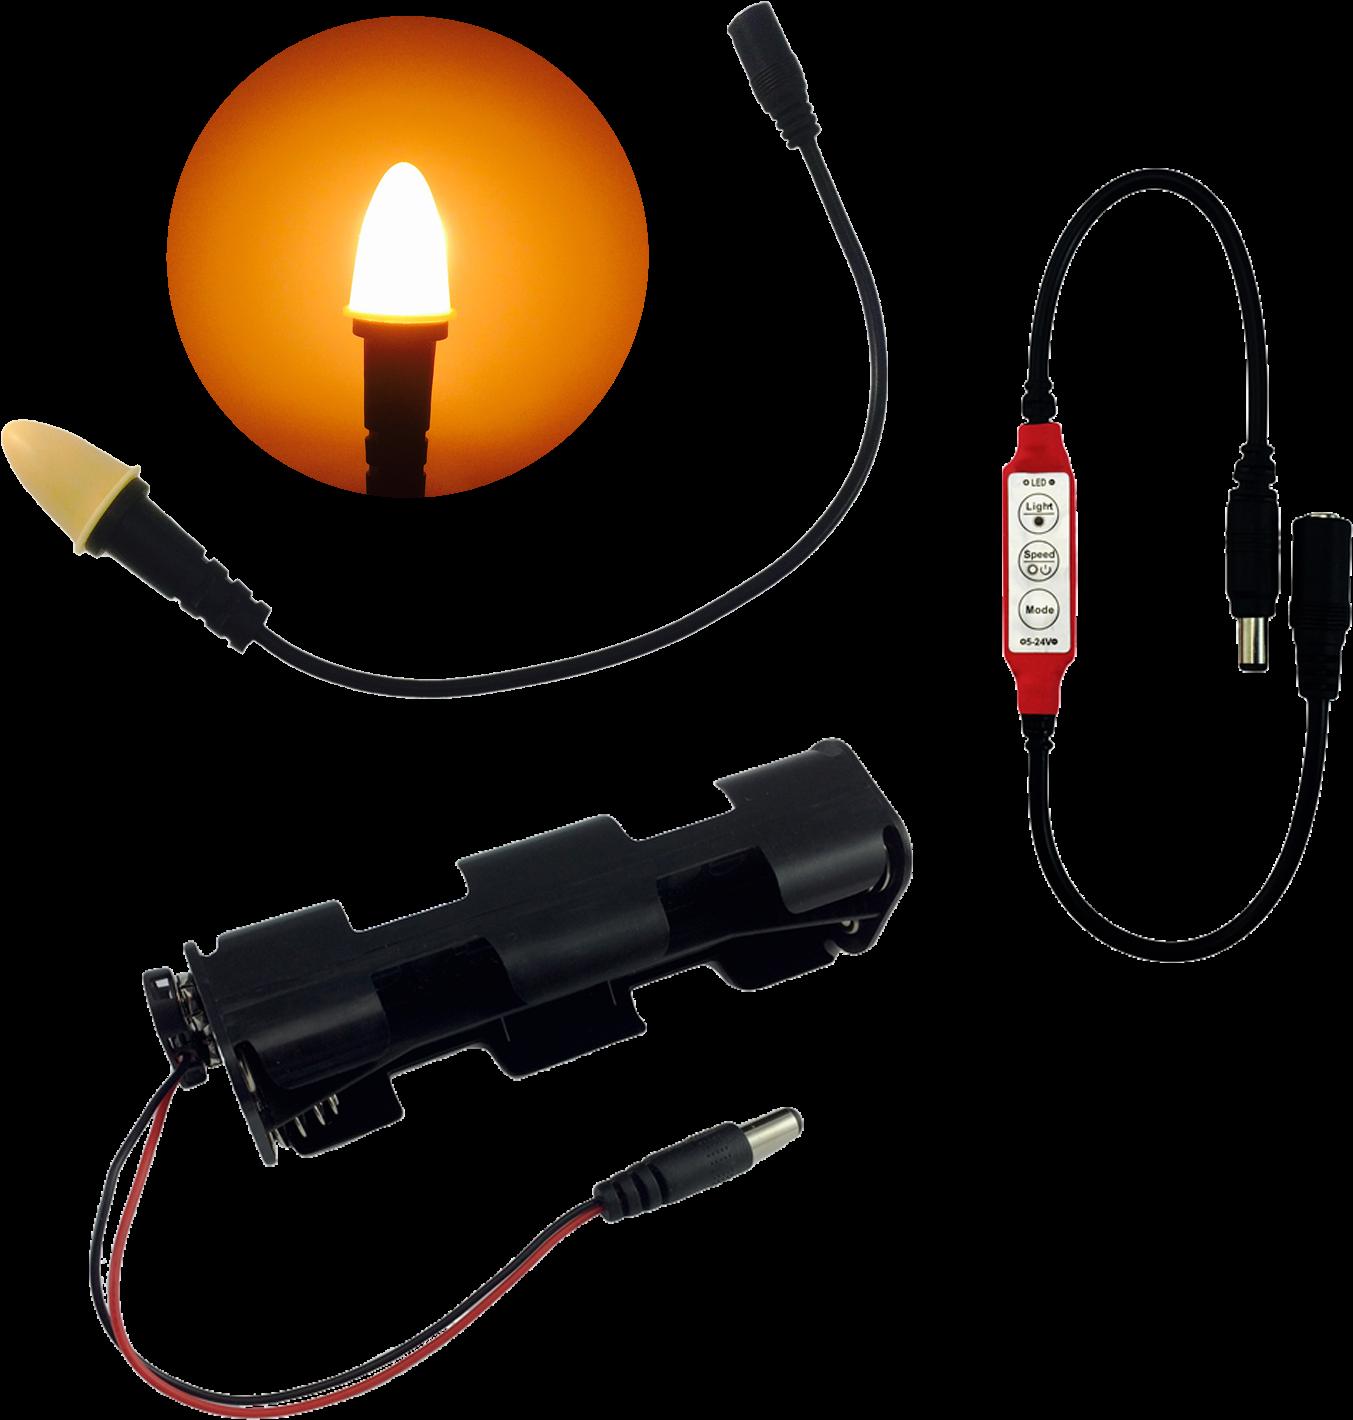 Eel Enhanced Effects Light, Cfl1 Candle Flame Light - Led